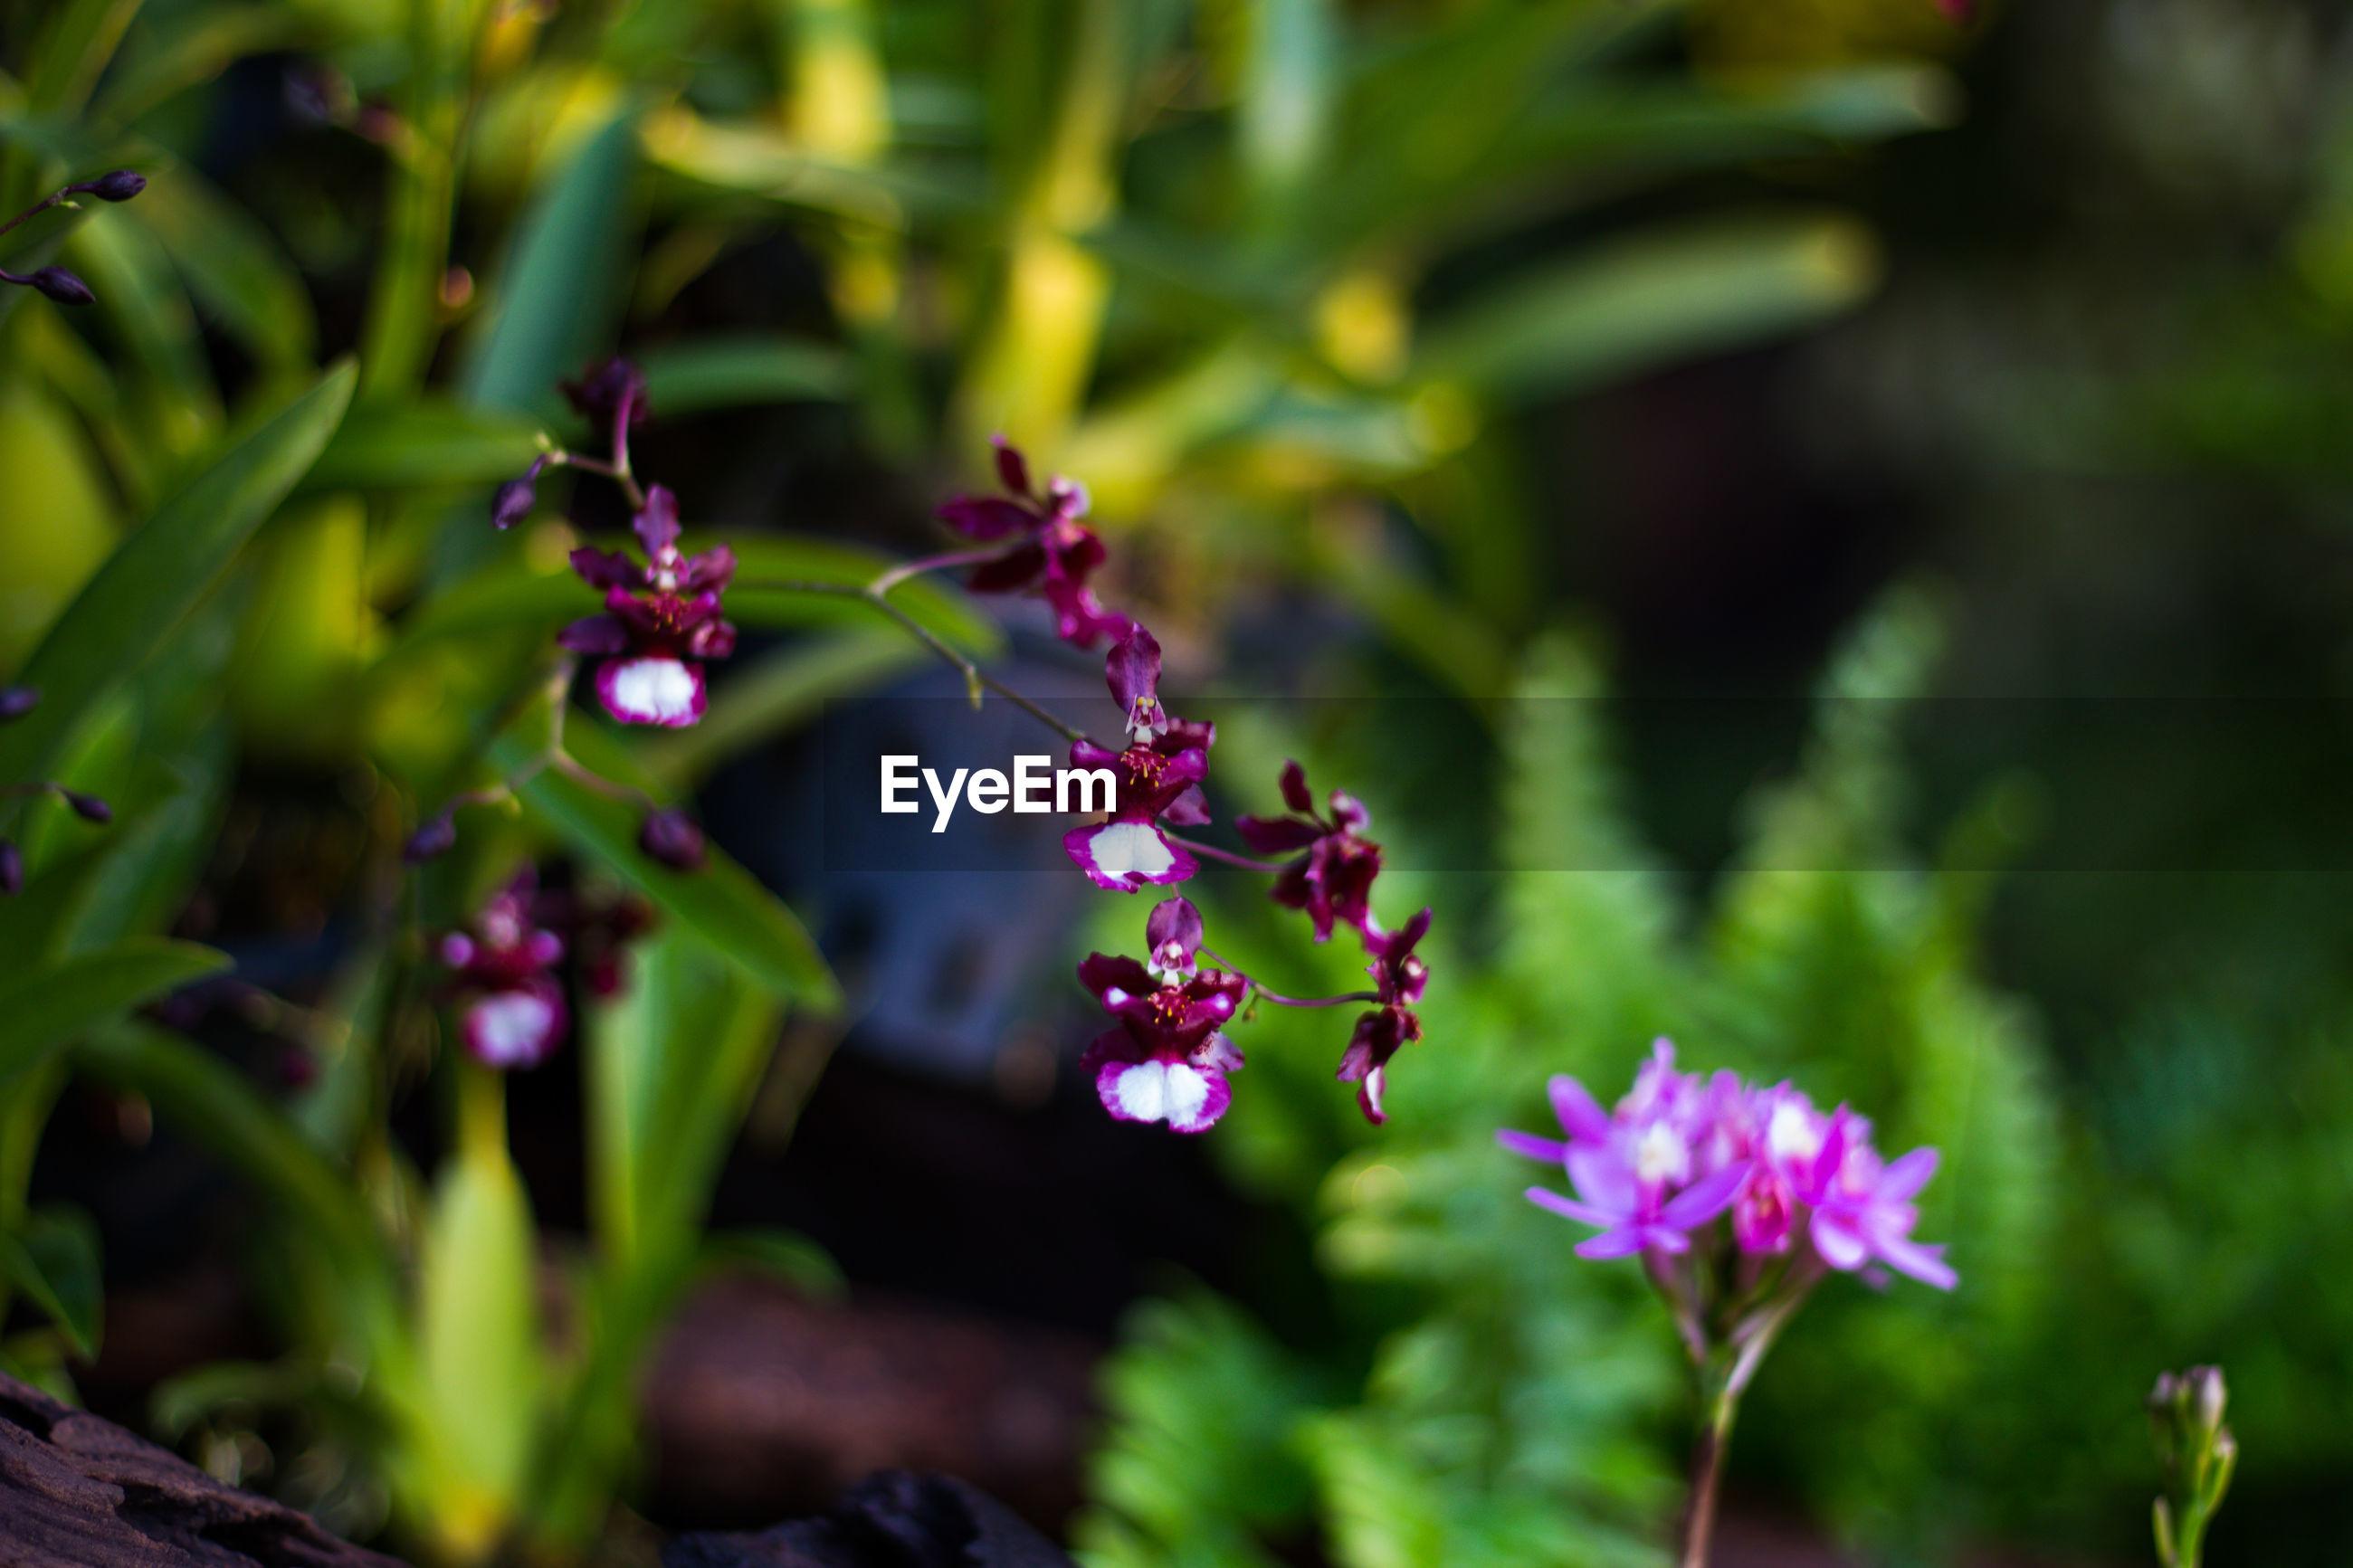 CLOSE UP OF PURPLE FLOWERING PLANT